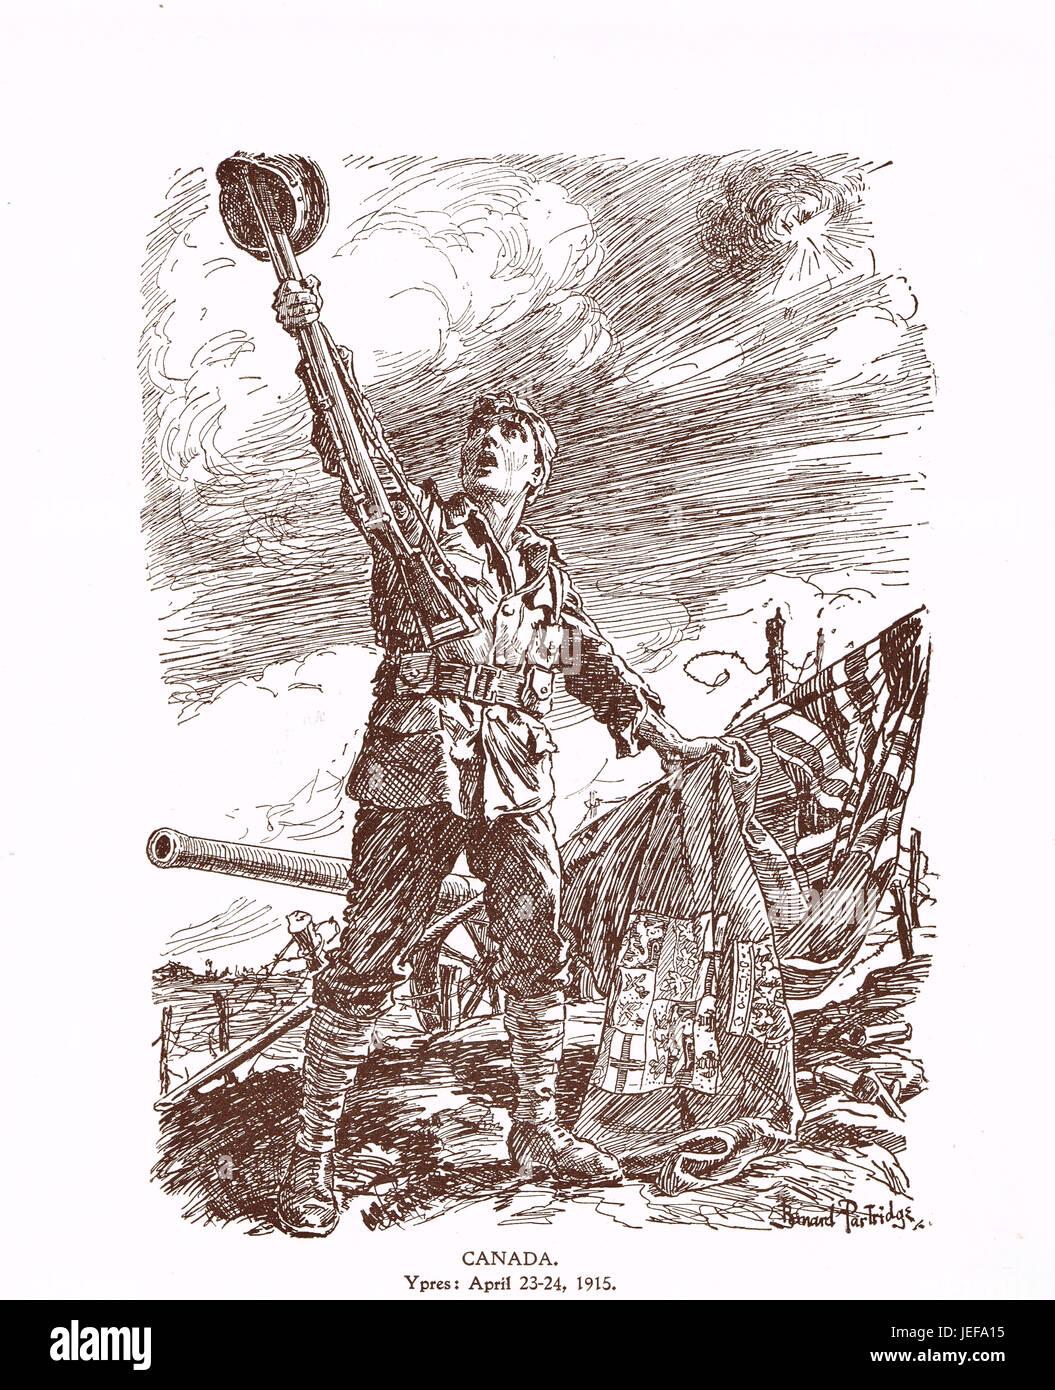 Punch Cartoon Canada at Ypres April 23-24 1915 - Stock Image